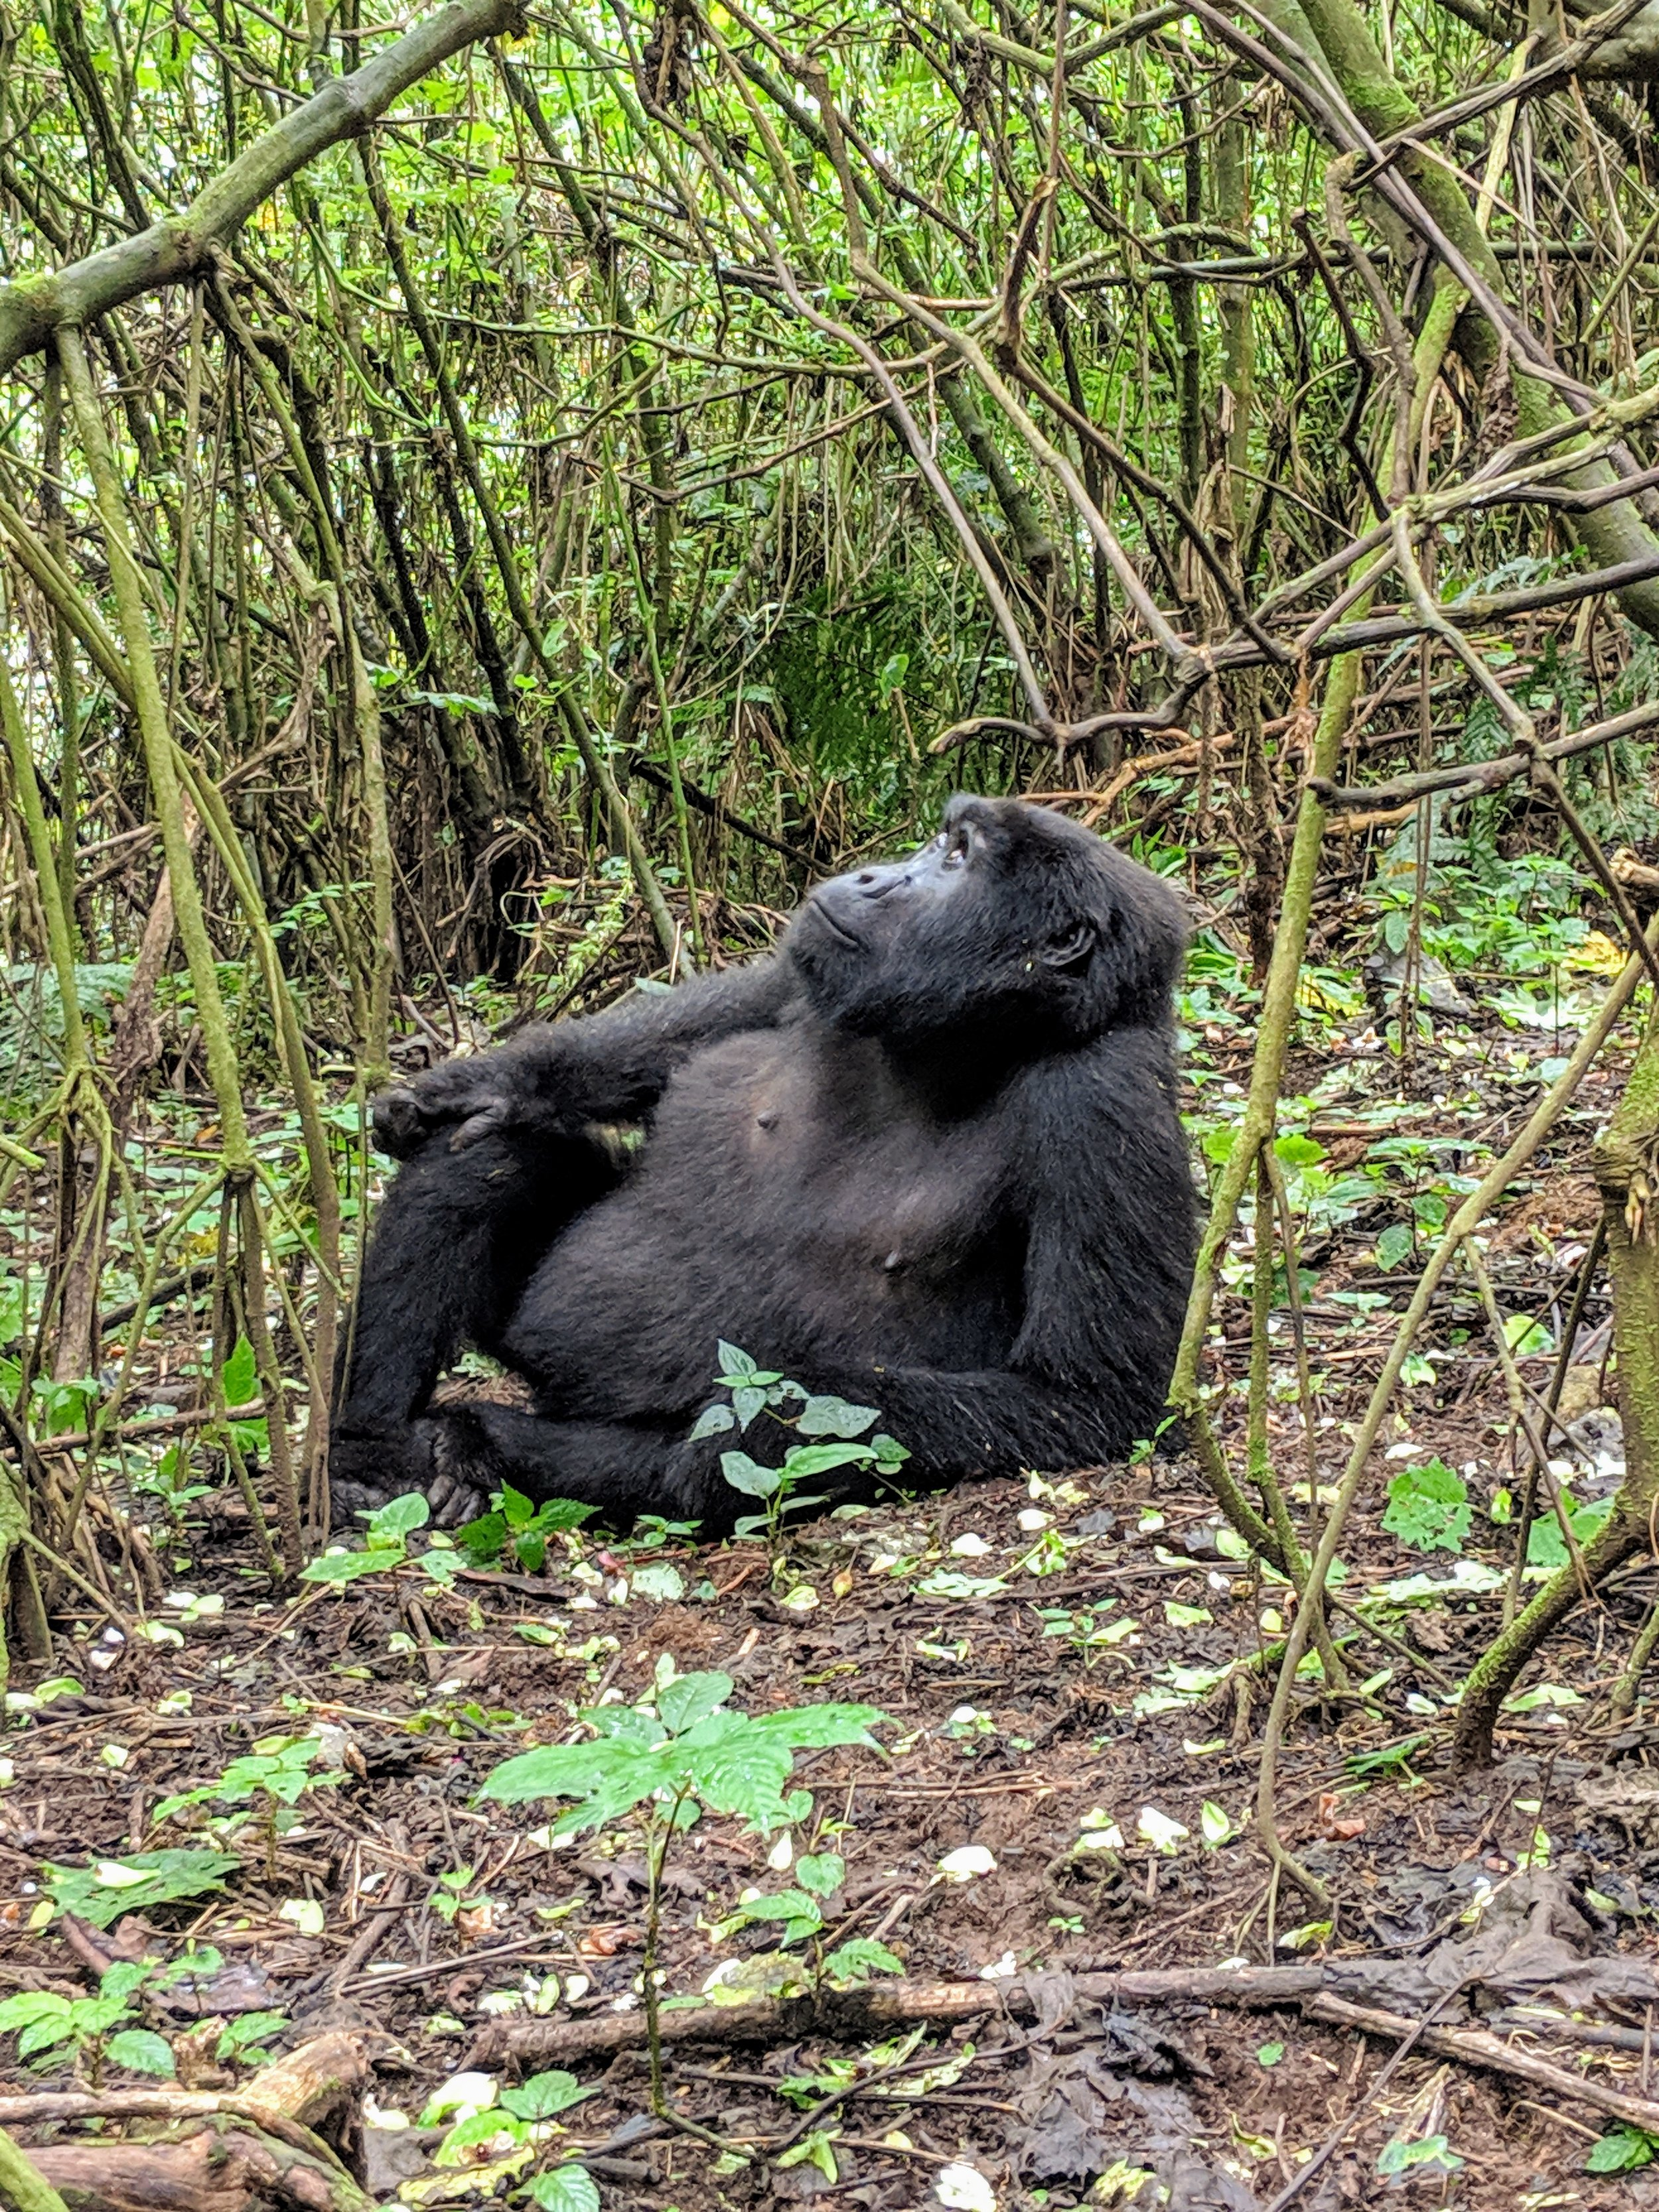 A wild mountain gorilla in Bwindi Impenetrable National Park. Photographer: Elisabeth Engl